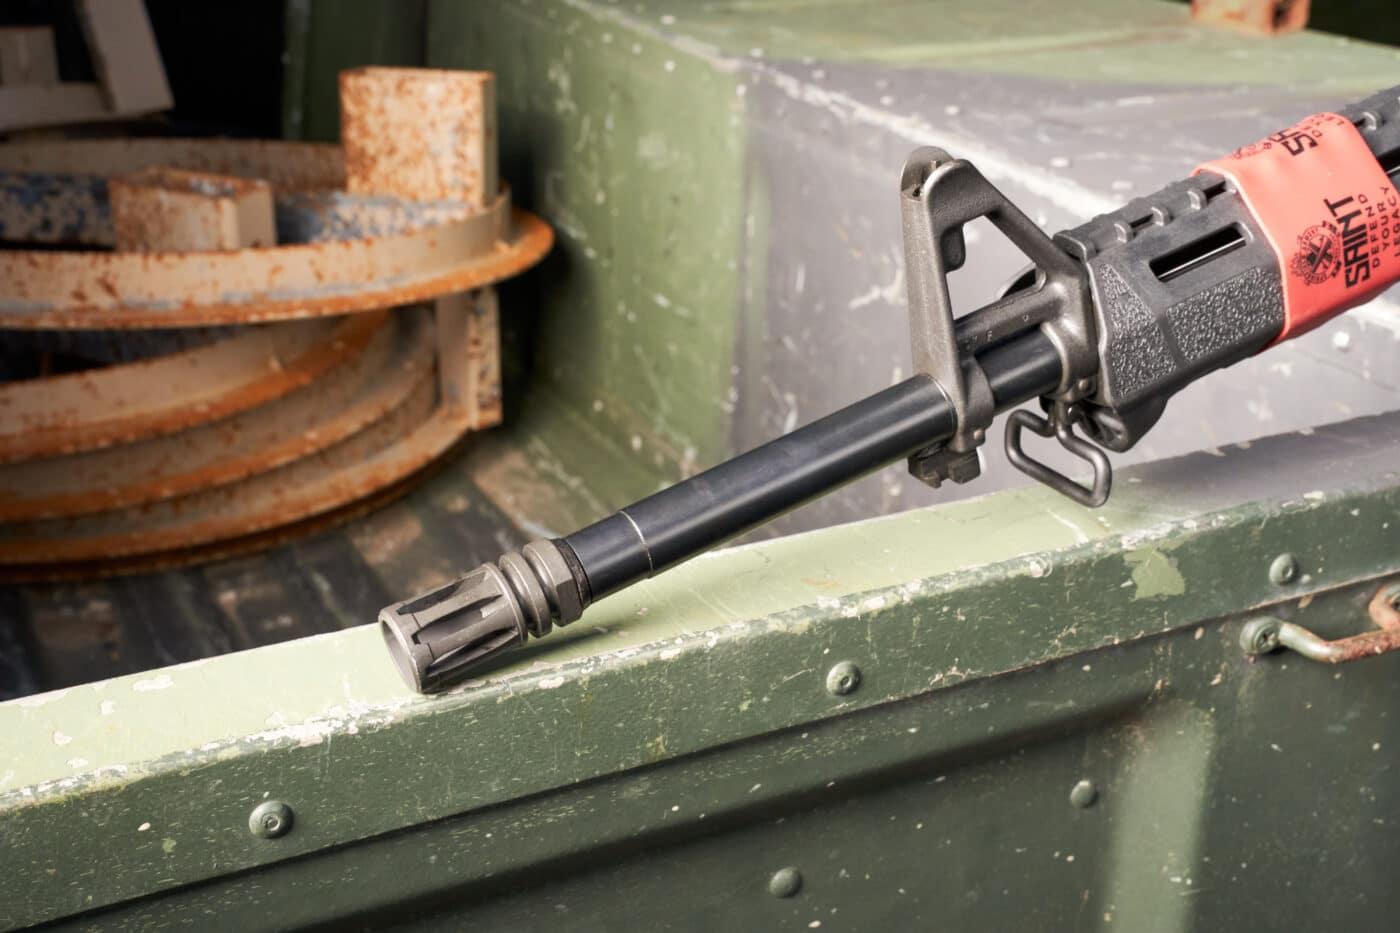 A2 birdcage flash hider on Springfield AR rifle